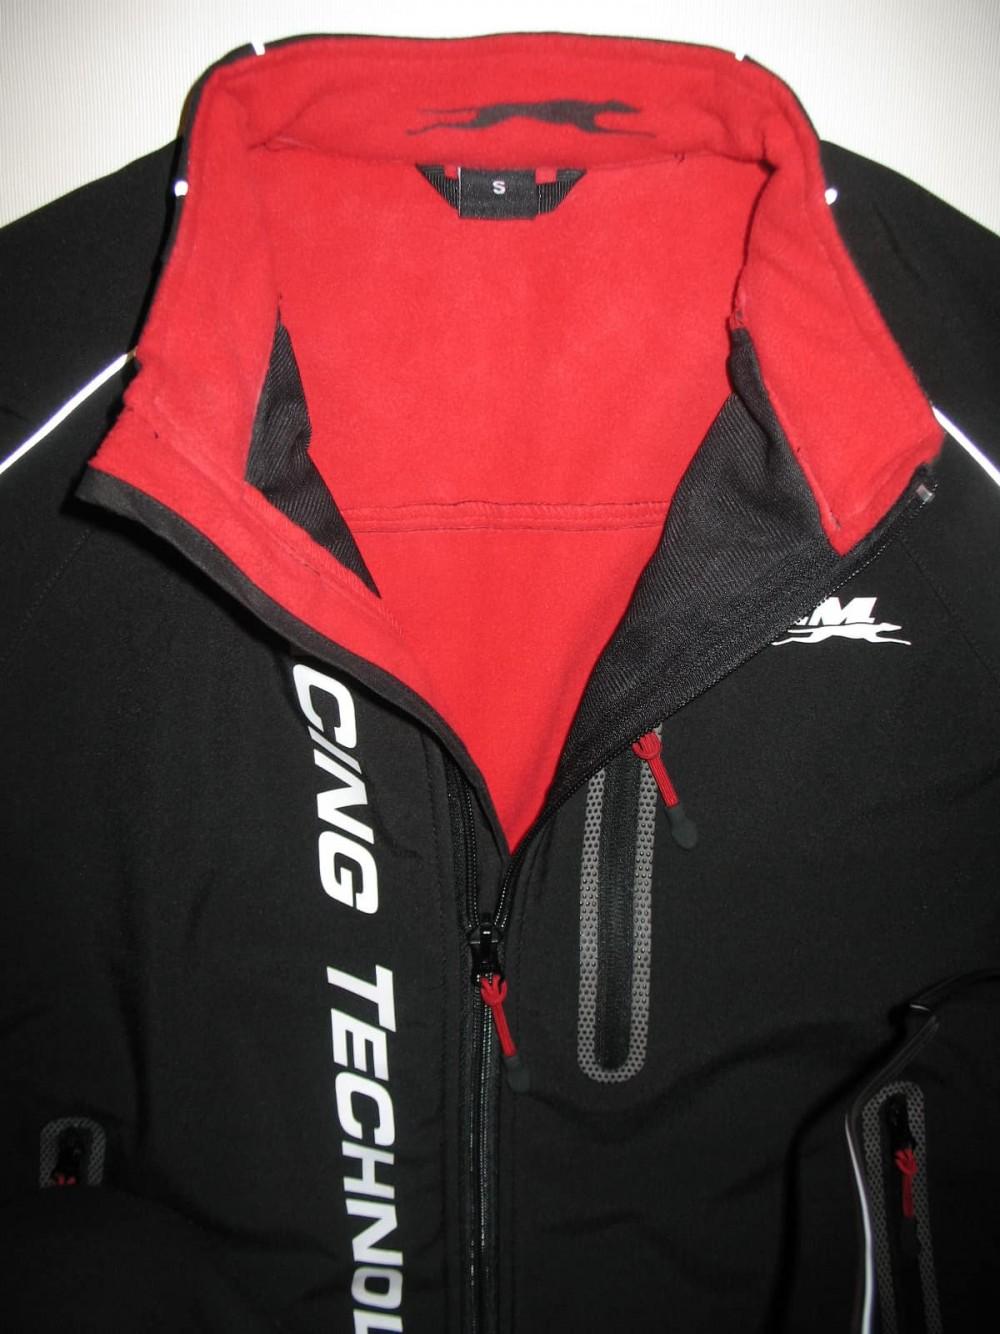 Жилет FLM sports softshell 1.0 vest (размер S) - 6